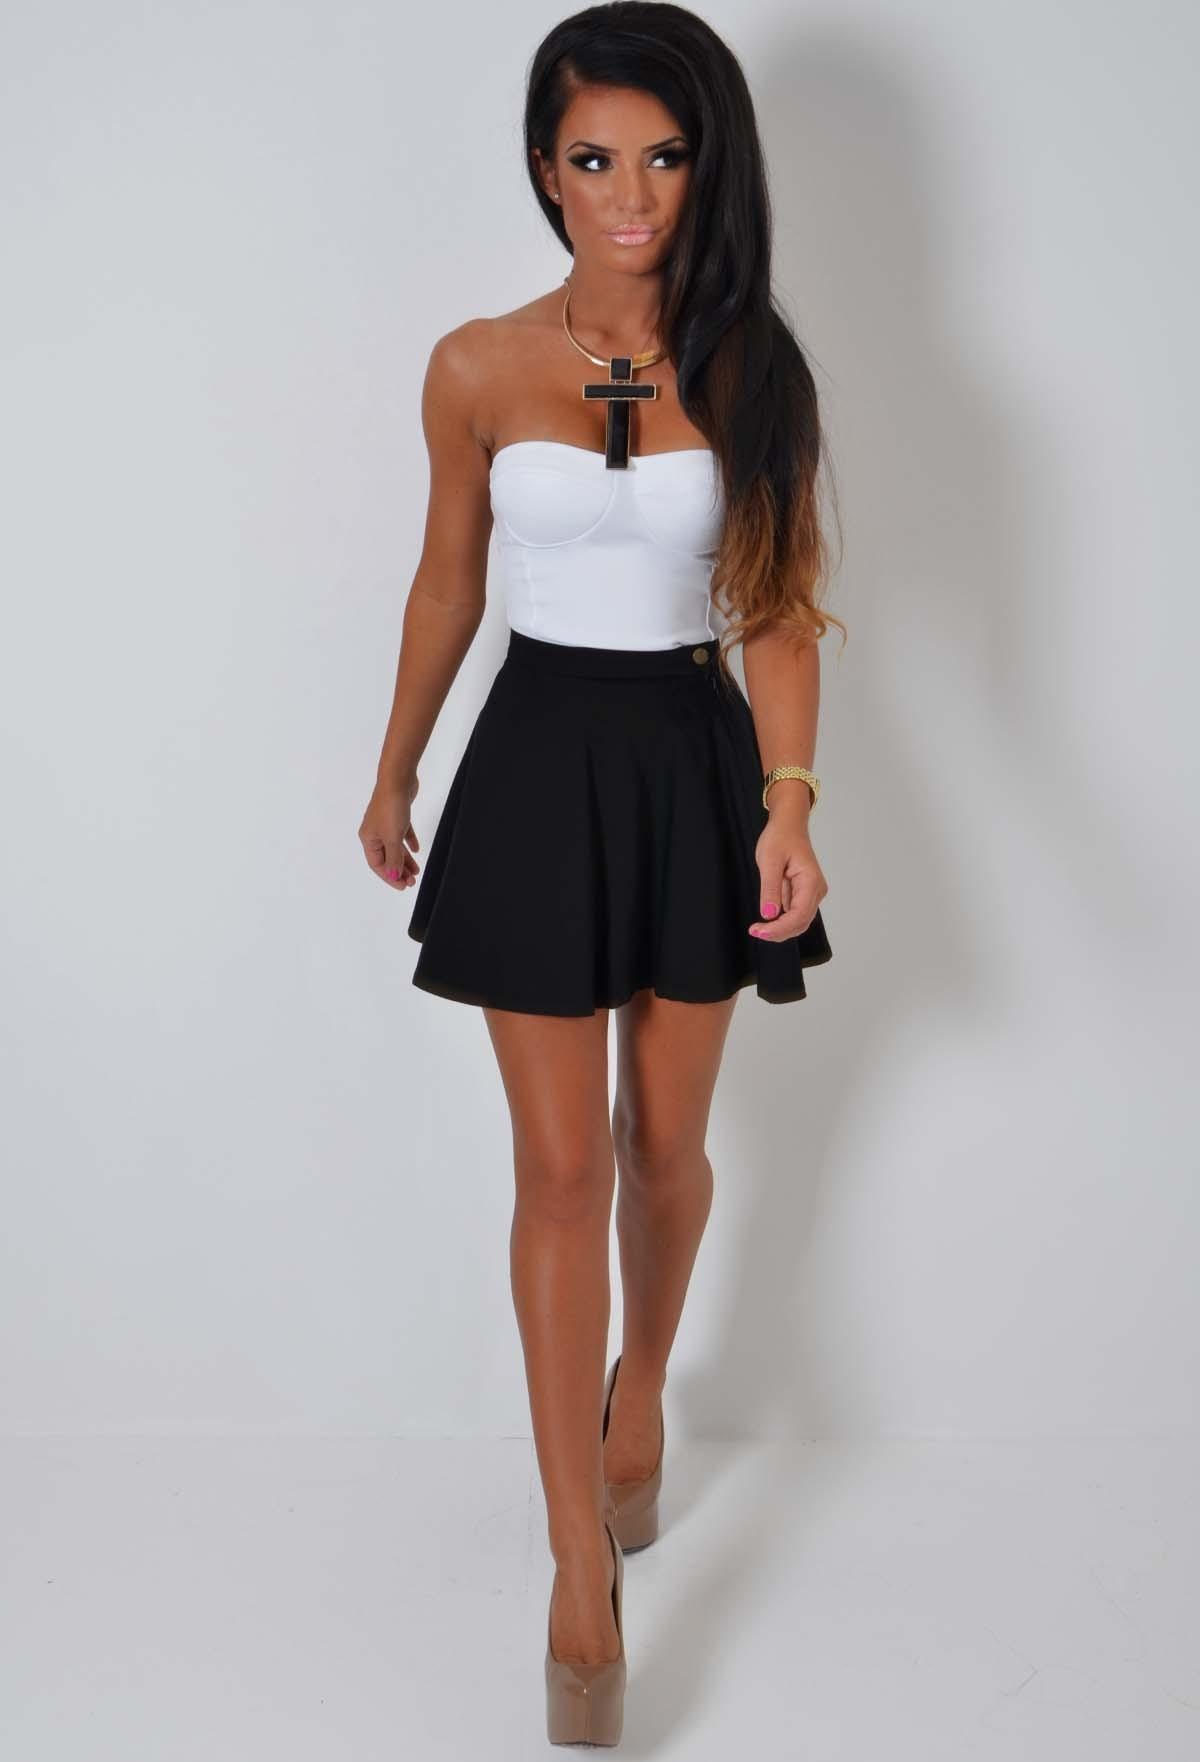 Donya Black High Waist Skater Skirt | Pink Boutique